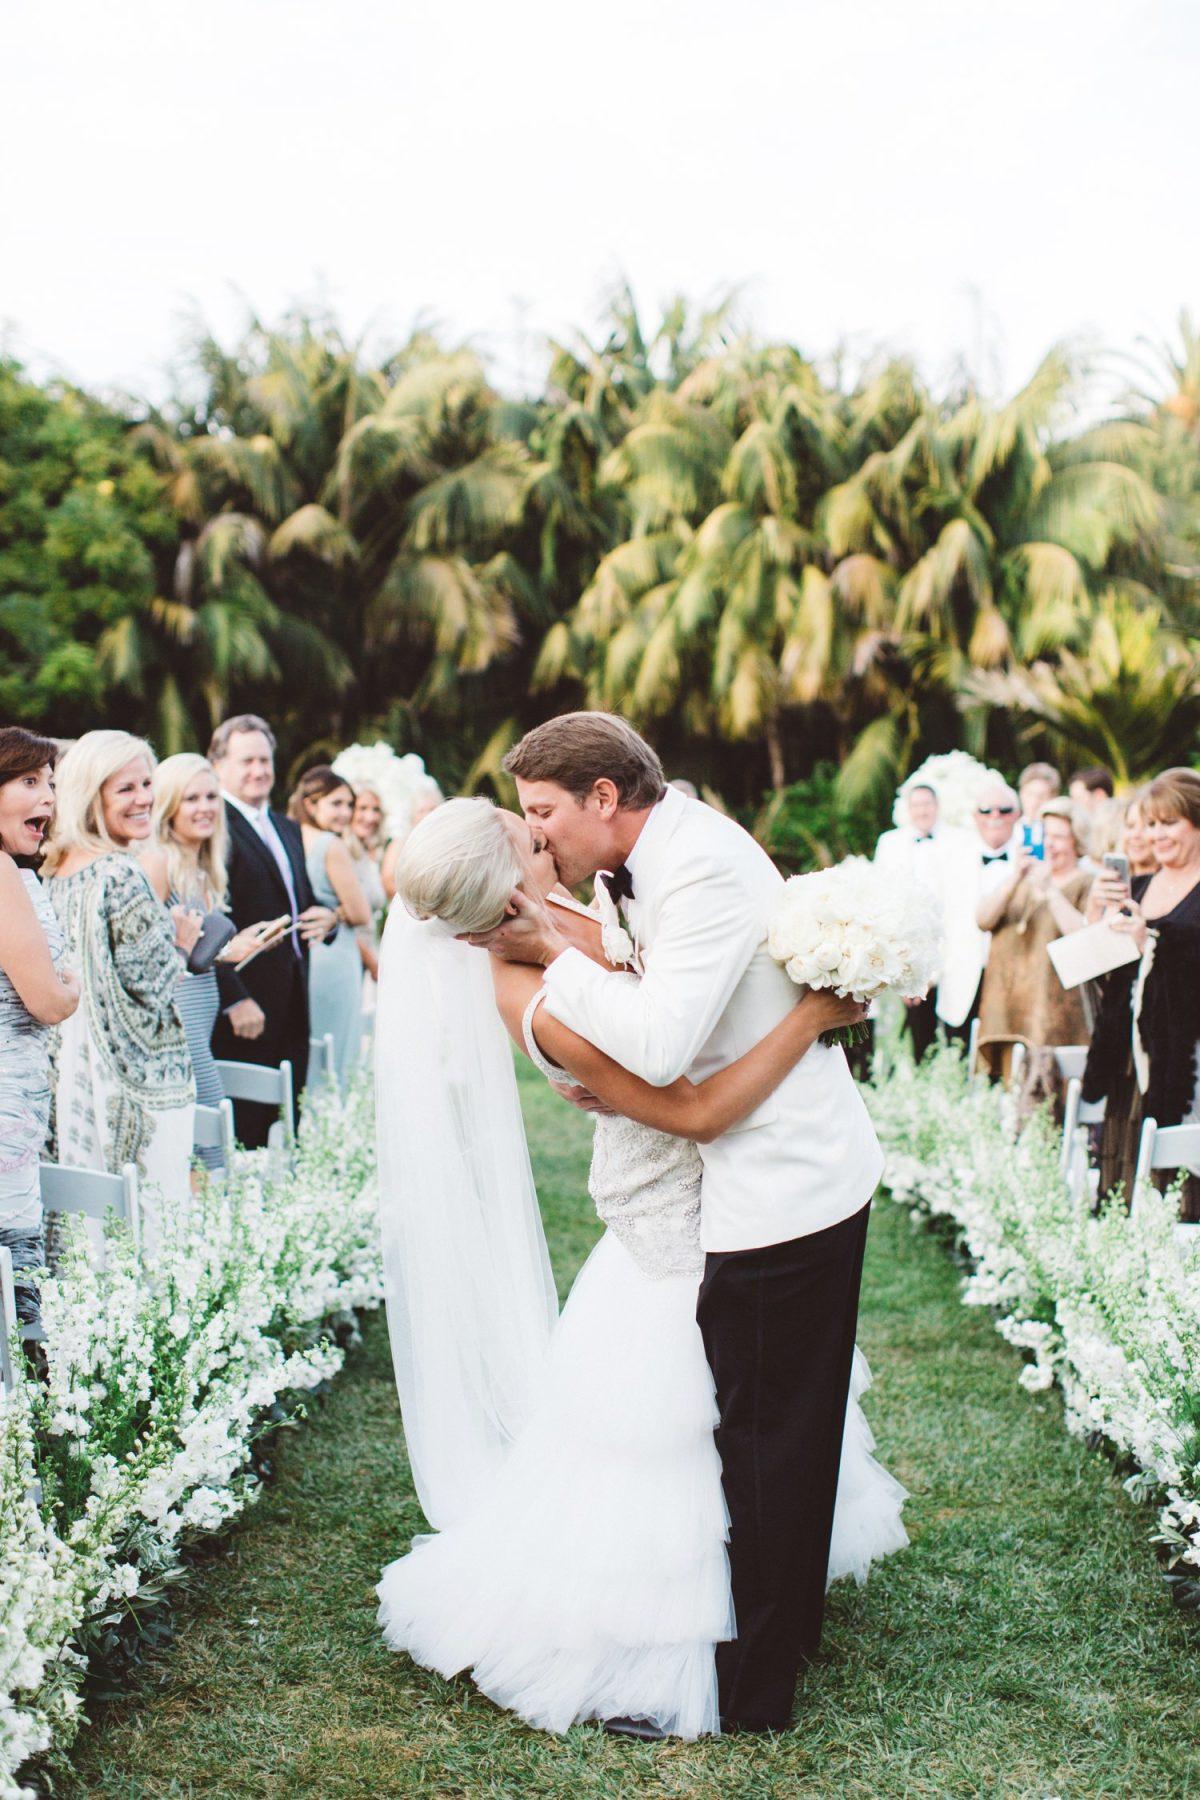 Four Seasons Resort Biltmore SAnta Barbara, CA  as Lead Associate photography with wedding designer Wedding Kate & CasaBlanca Flowers  for Anna Delores Photography 2017